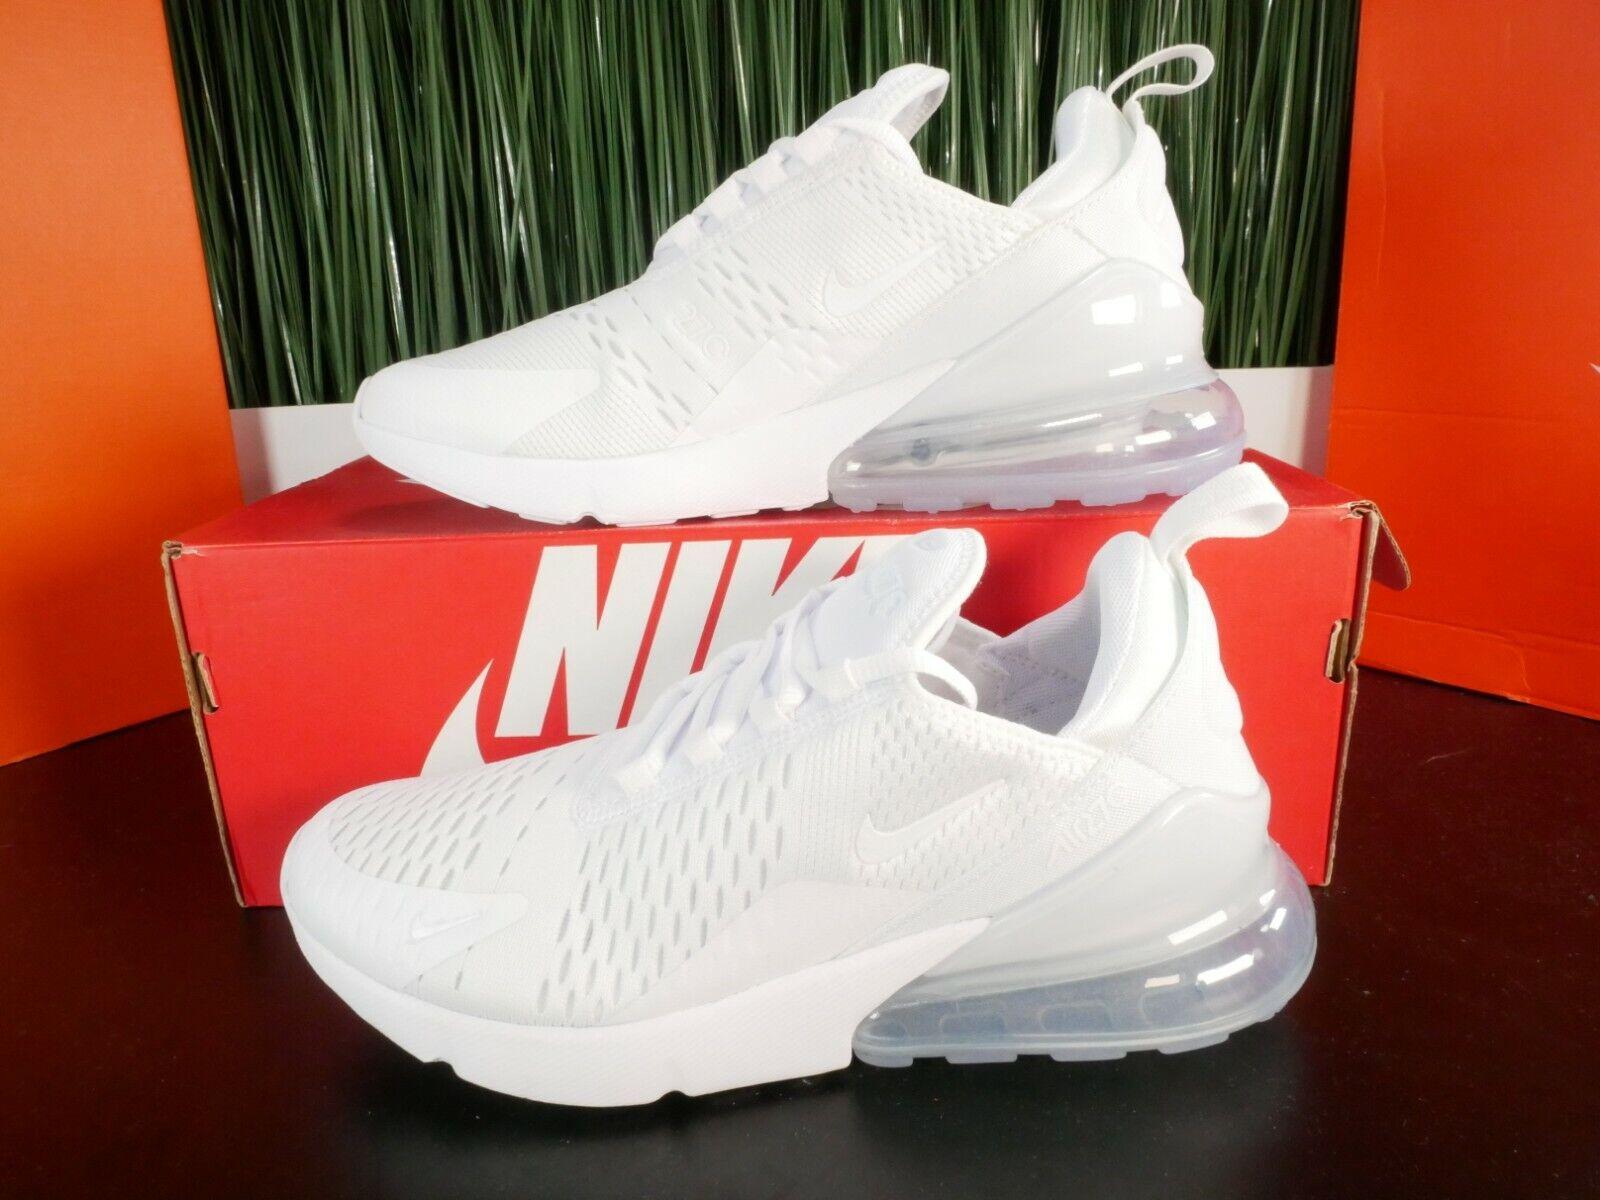 RARE Nike Air Max 270 GS Unisex Triple White Womens Running Shoes Size  5.5-8.5